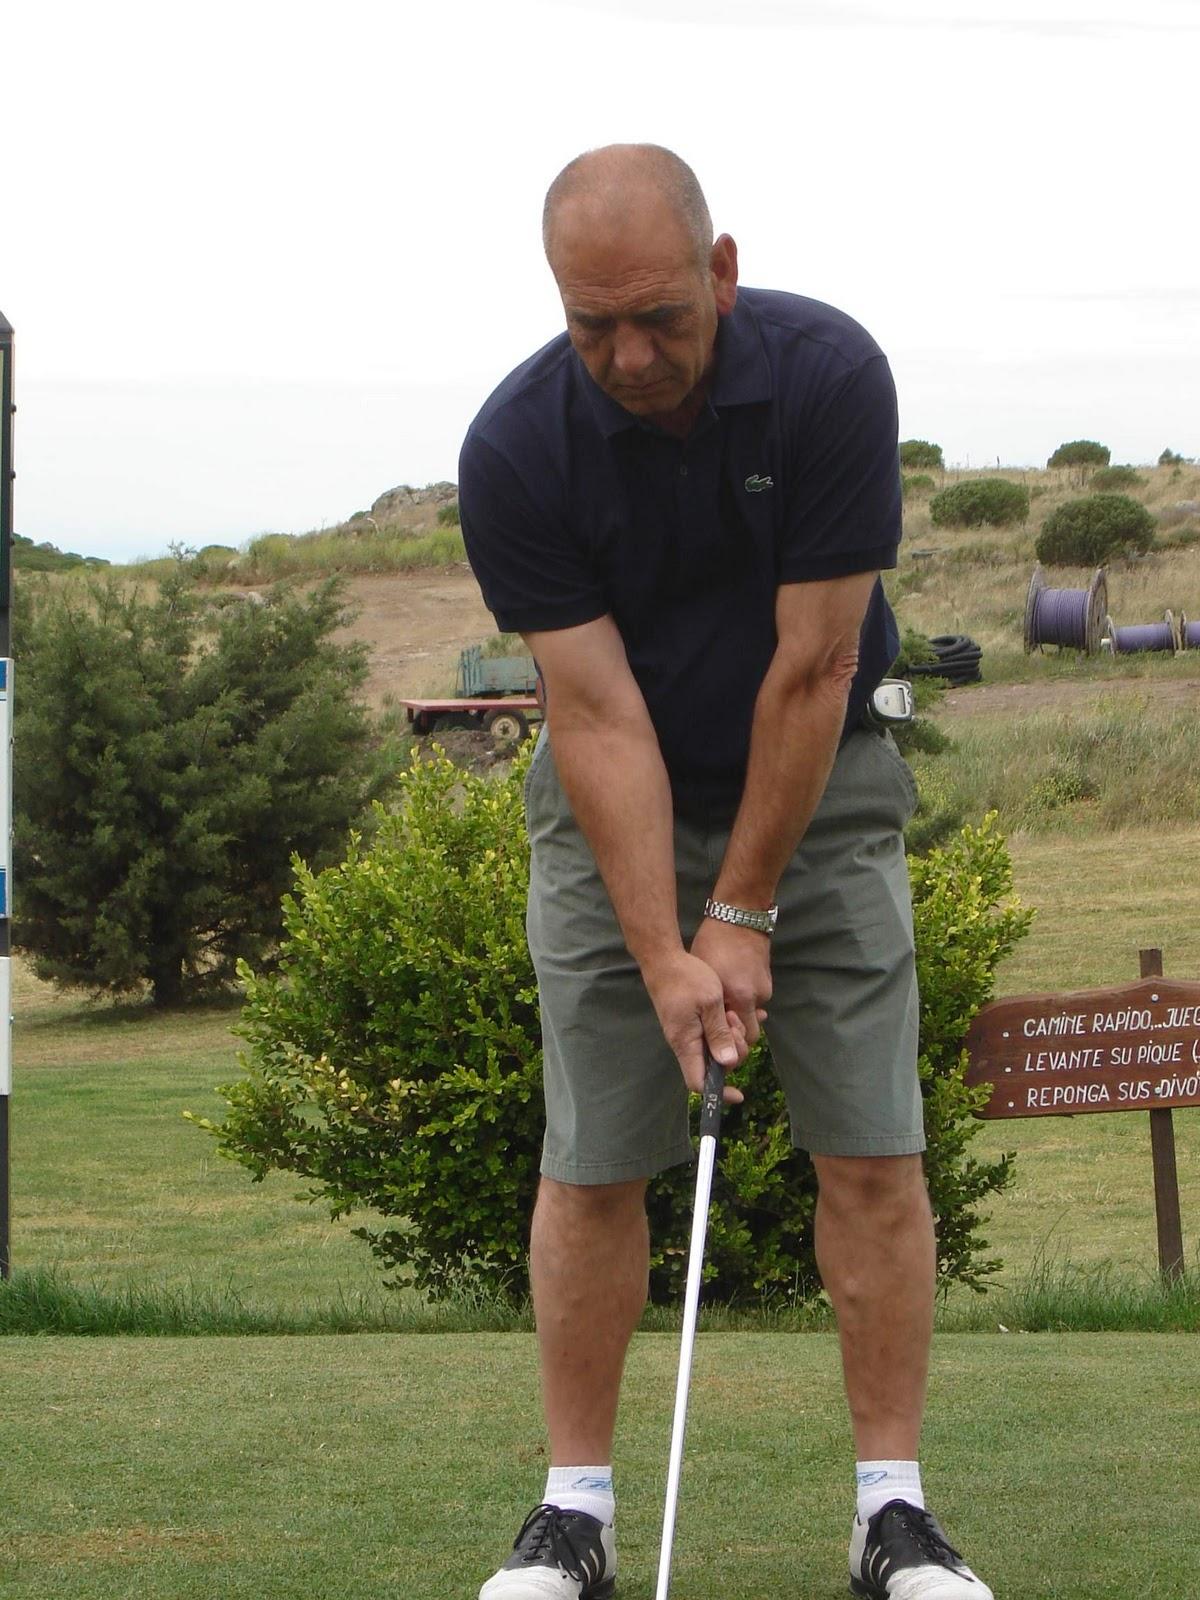 http://1.bp.blogspot.com/-Z_EBxpmDx2M/TKpTvYock-I/AAAAAAAAARE/cr_w7VFKhbg/s1600/Golfing+021.jpg